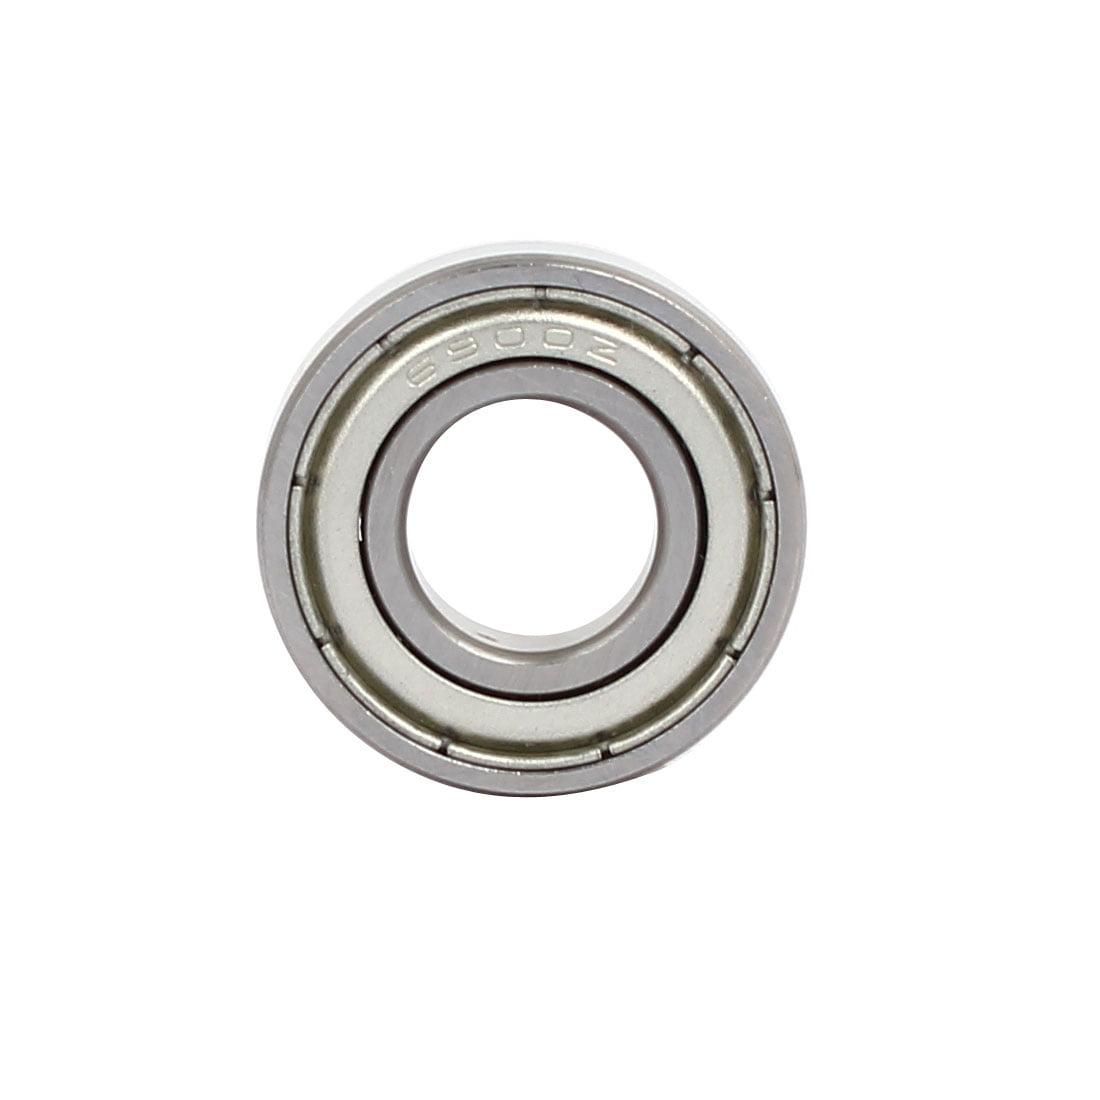 6900ZZ Steel Shielded Deep Groove Ball Bearings Silver Tone 22mmx10mmx6mm 10pcs